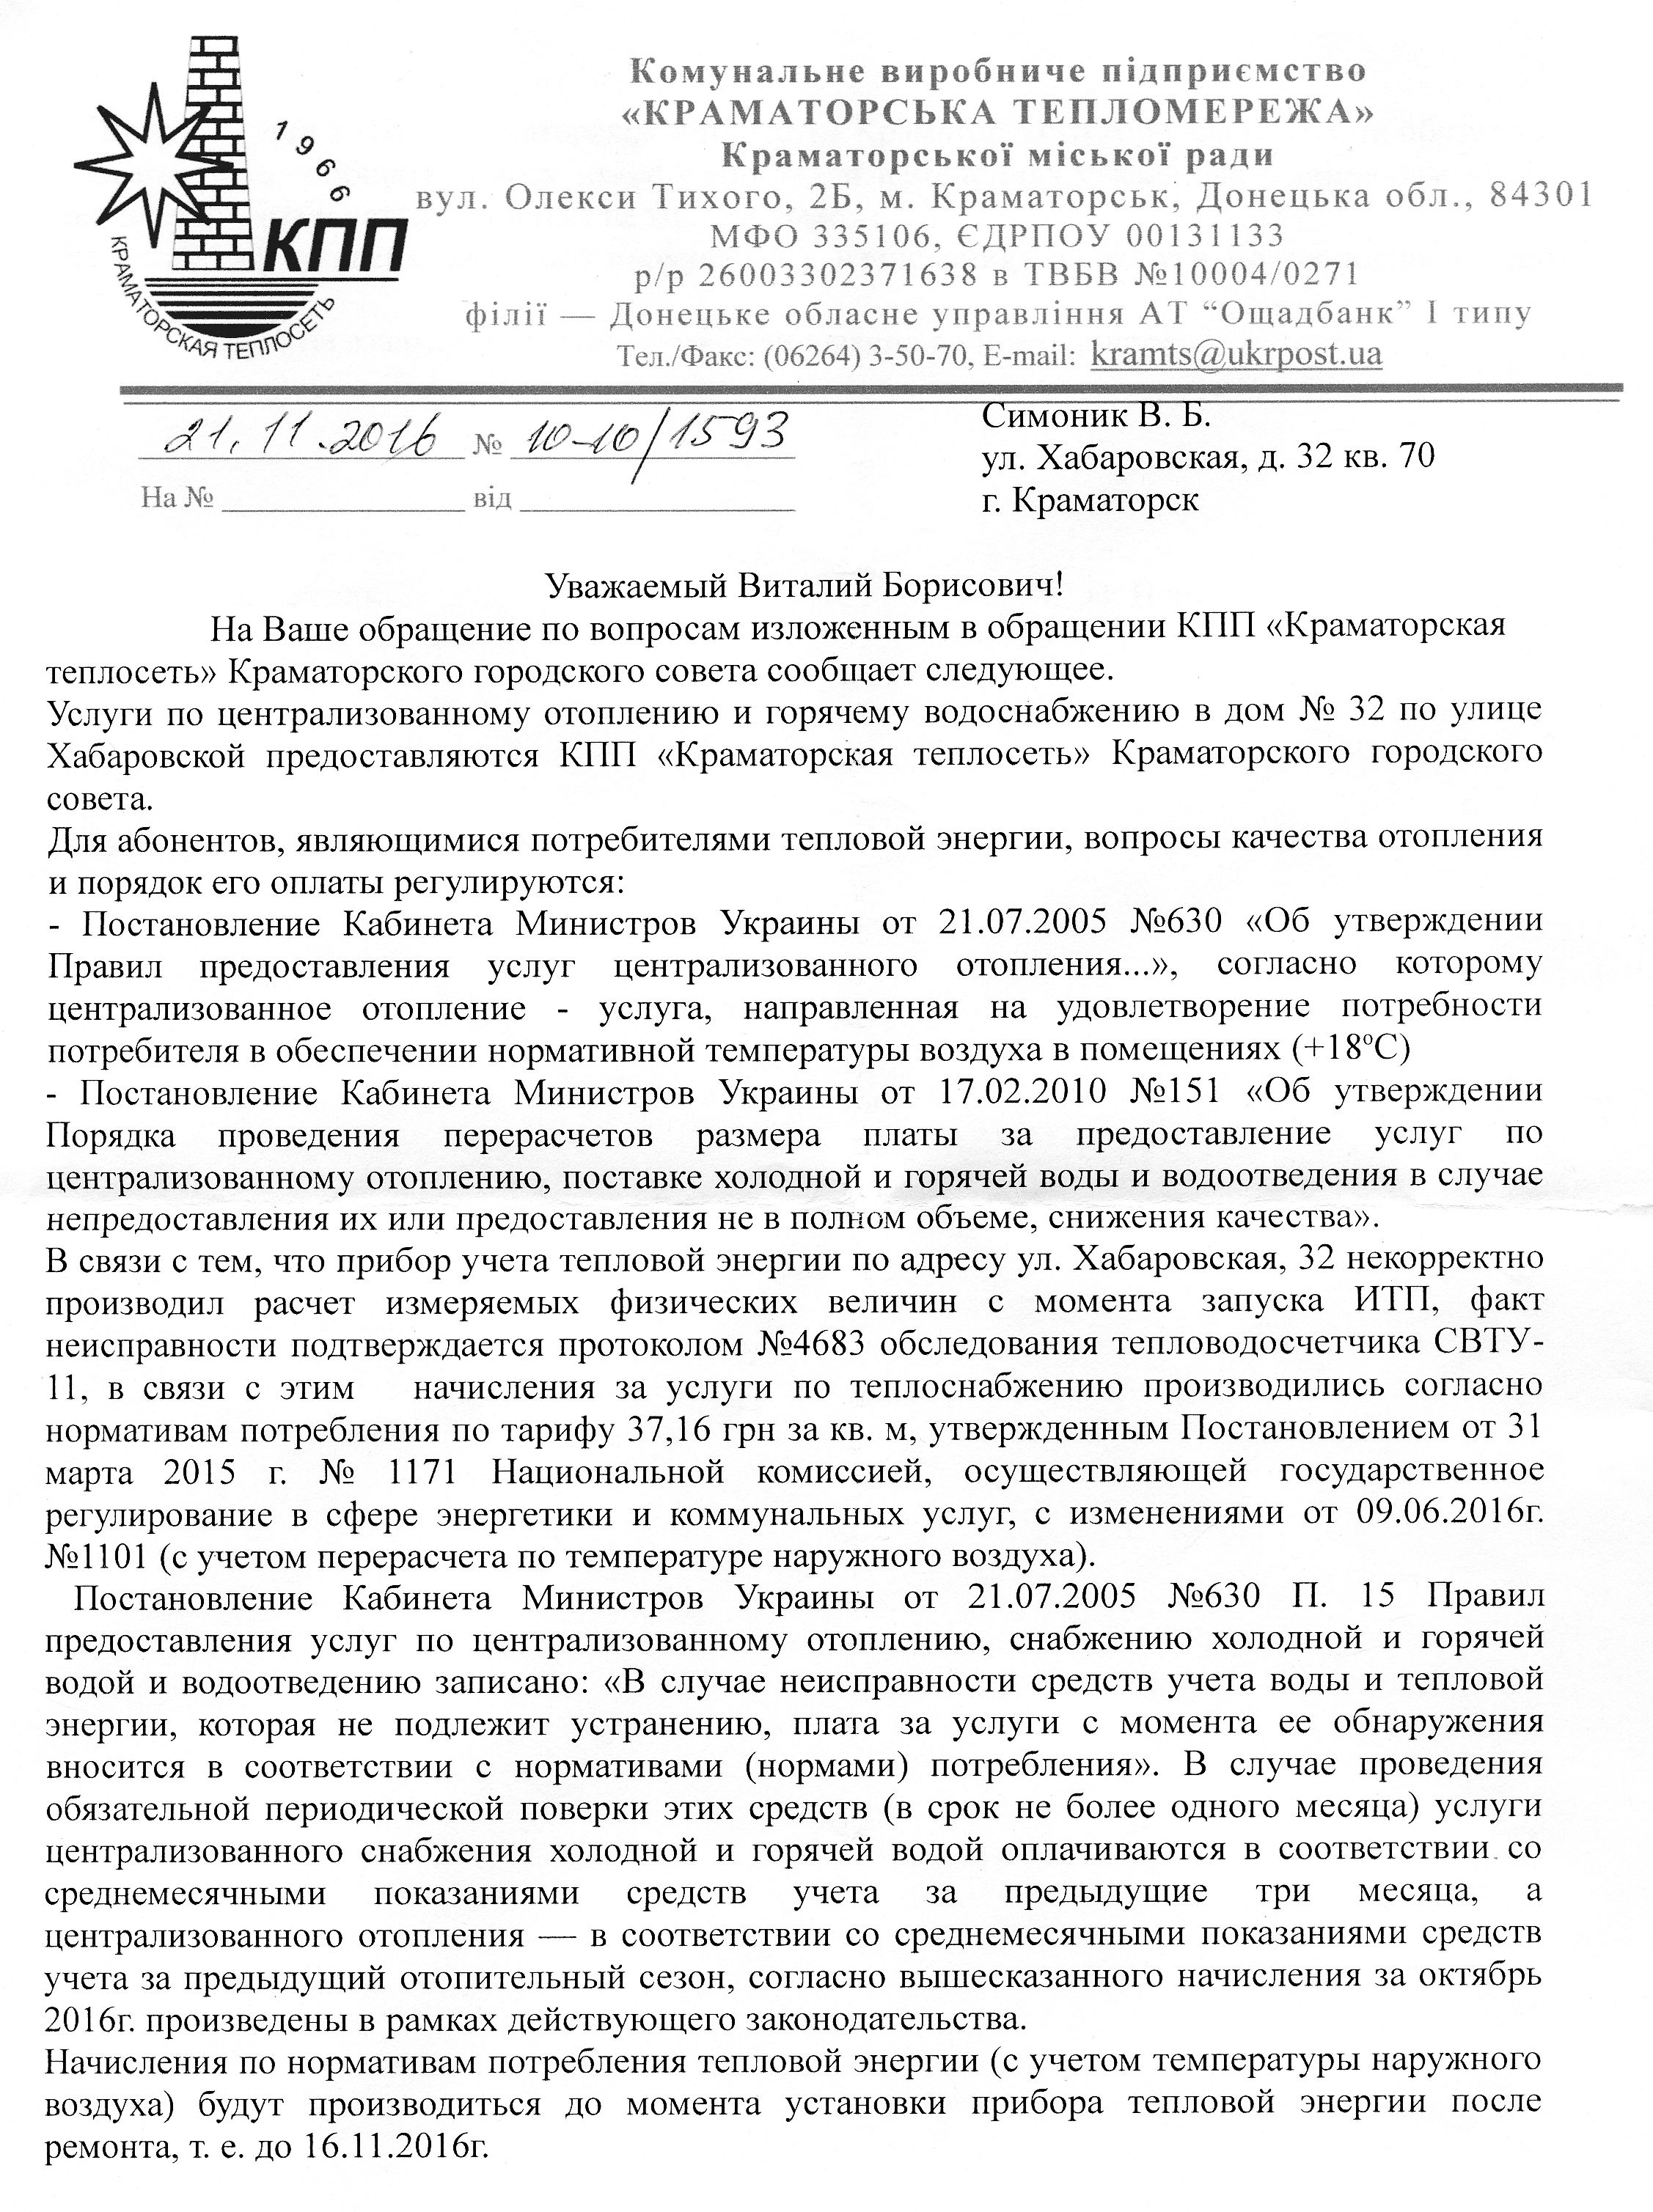 https://img-fotki.yandex.ru/get/194804/248142895.0/0_180fb3_f03a16_orig